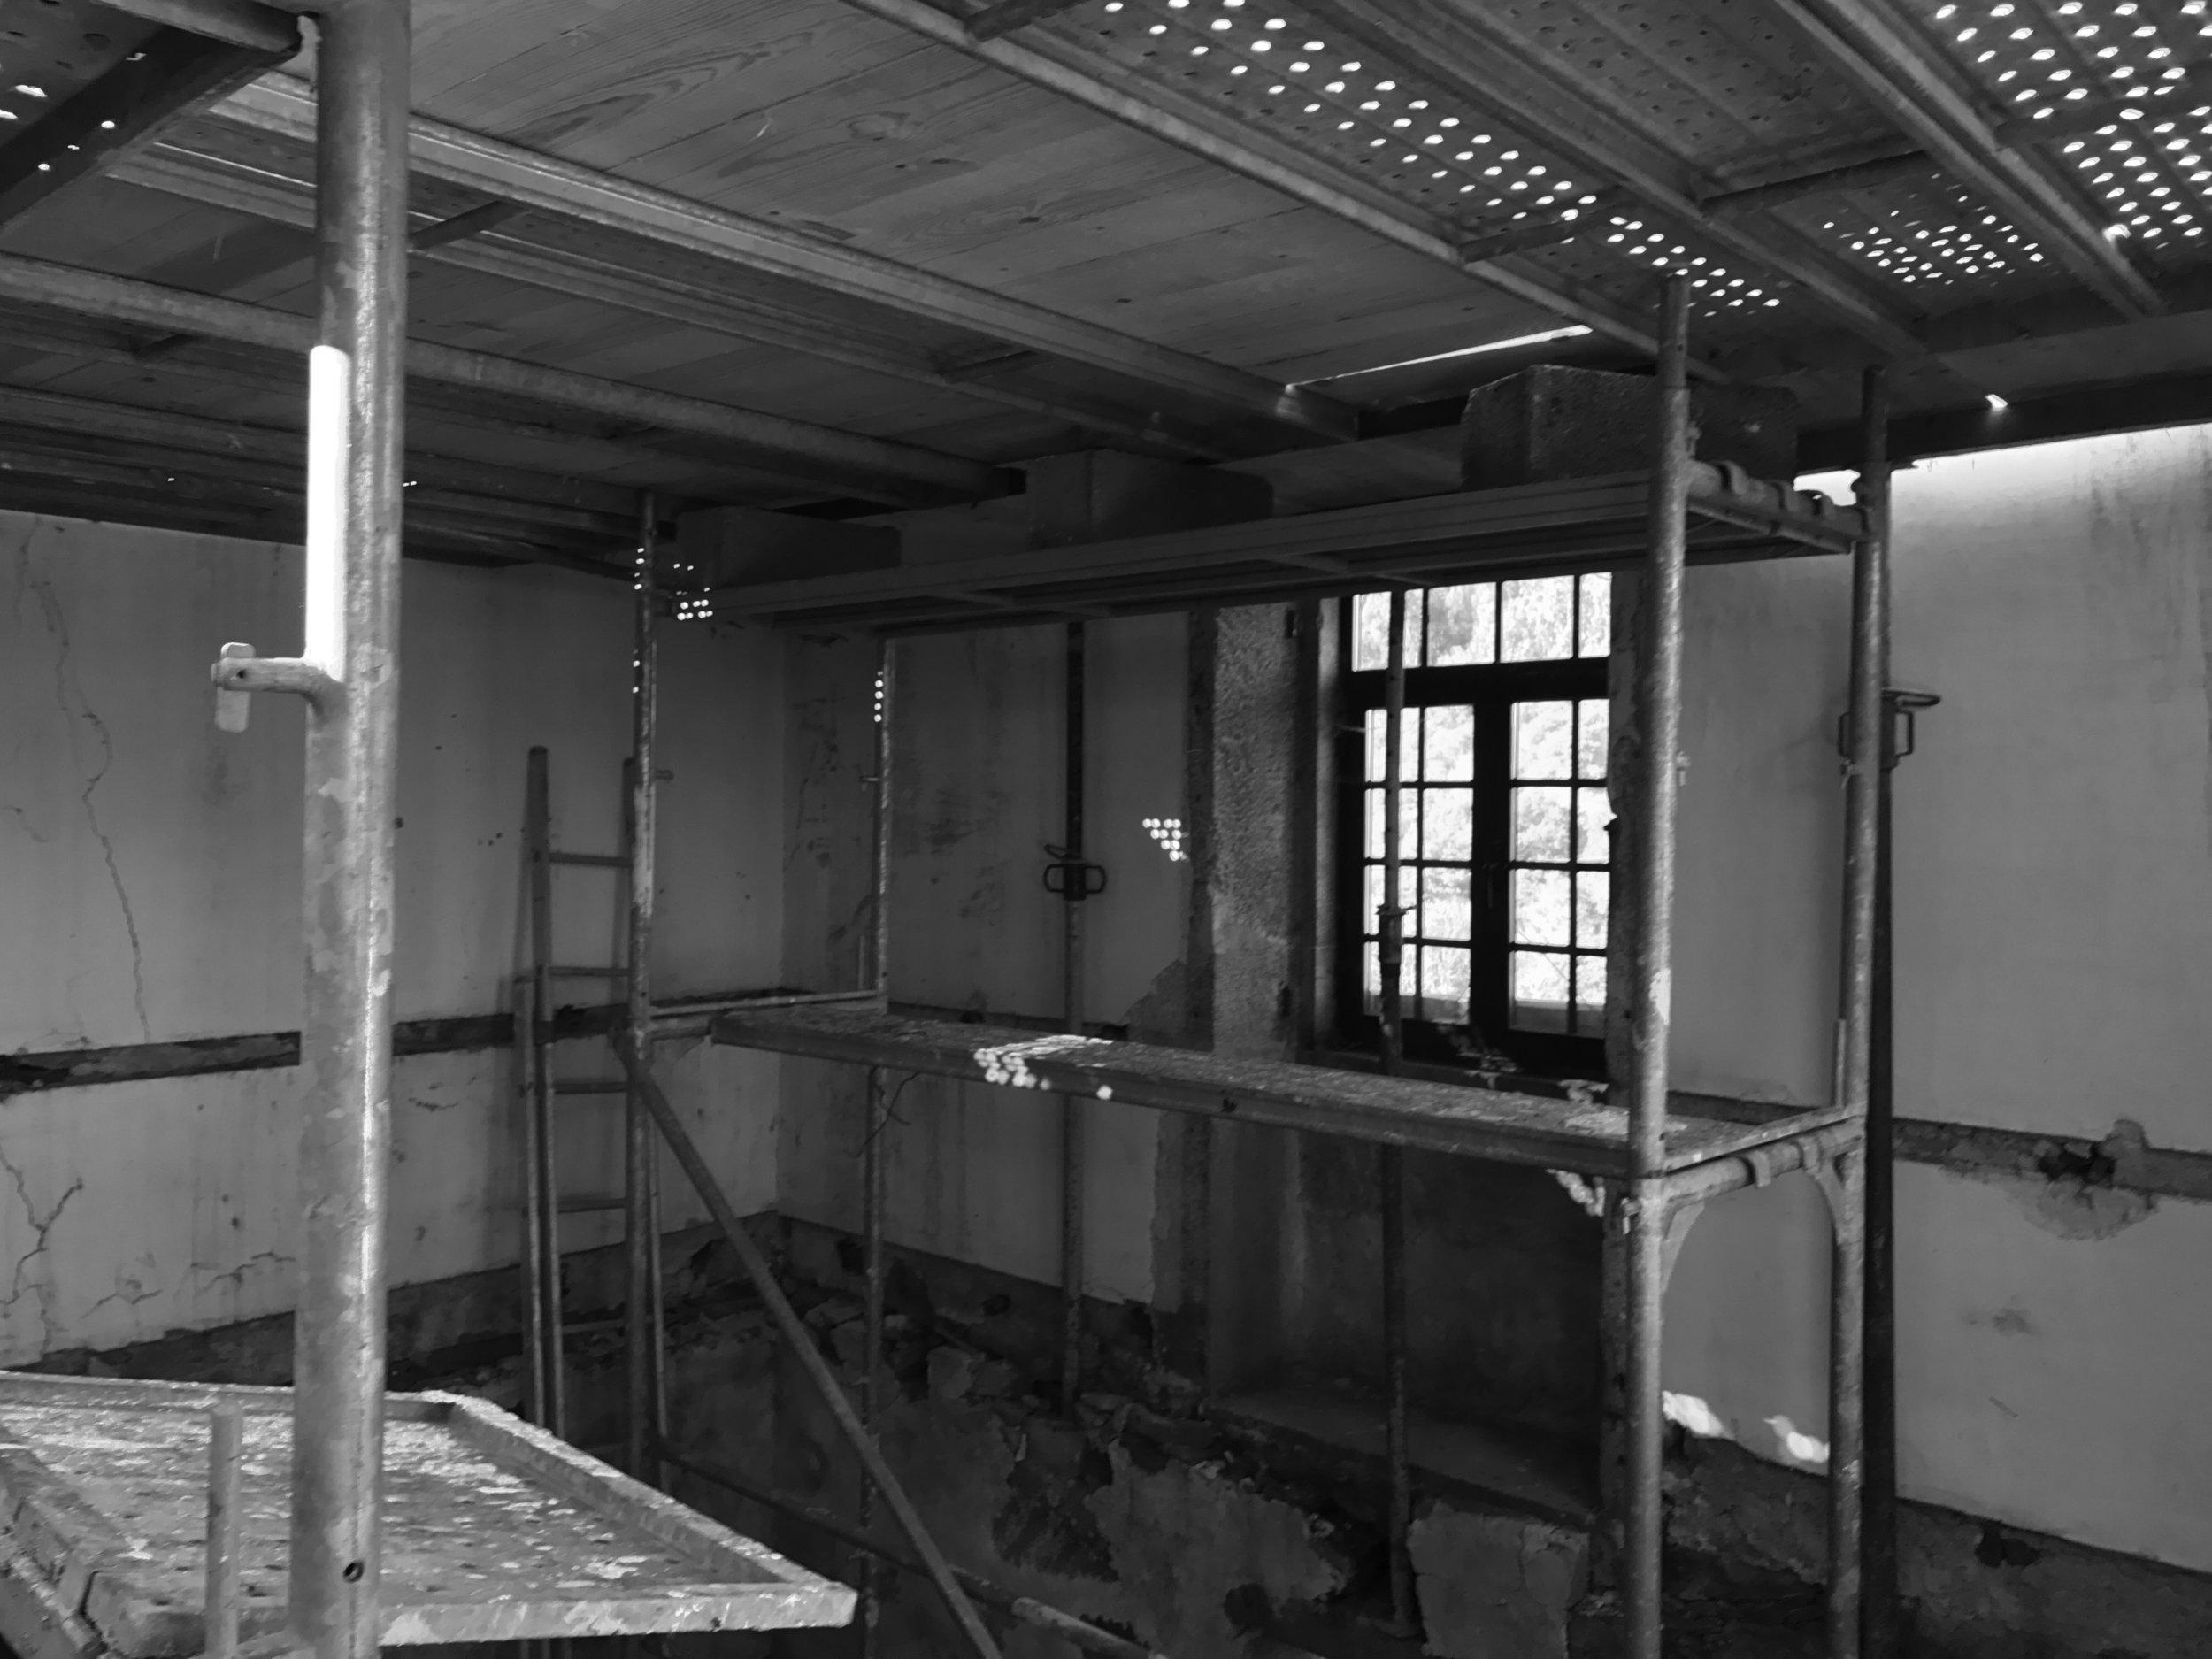 Moradia Folgorosa - Vale de Cambra - EVA atelier - Arquitectura - Obra - Arquitecto - Porto - EVA evolutionary architecture (2).jpg